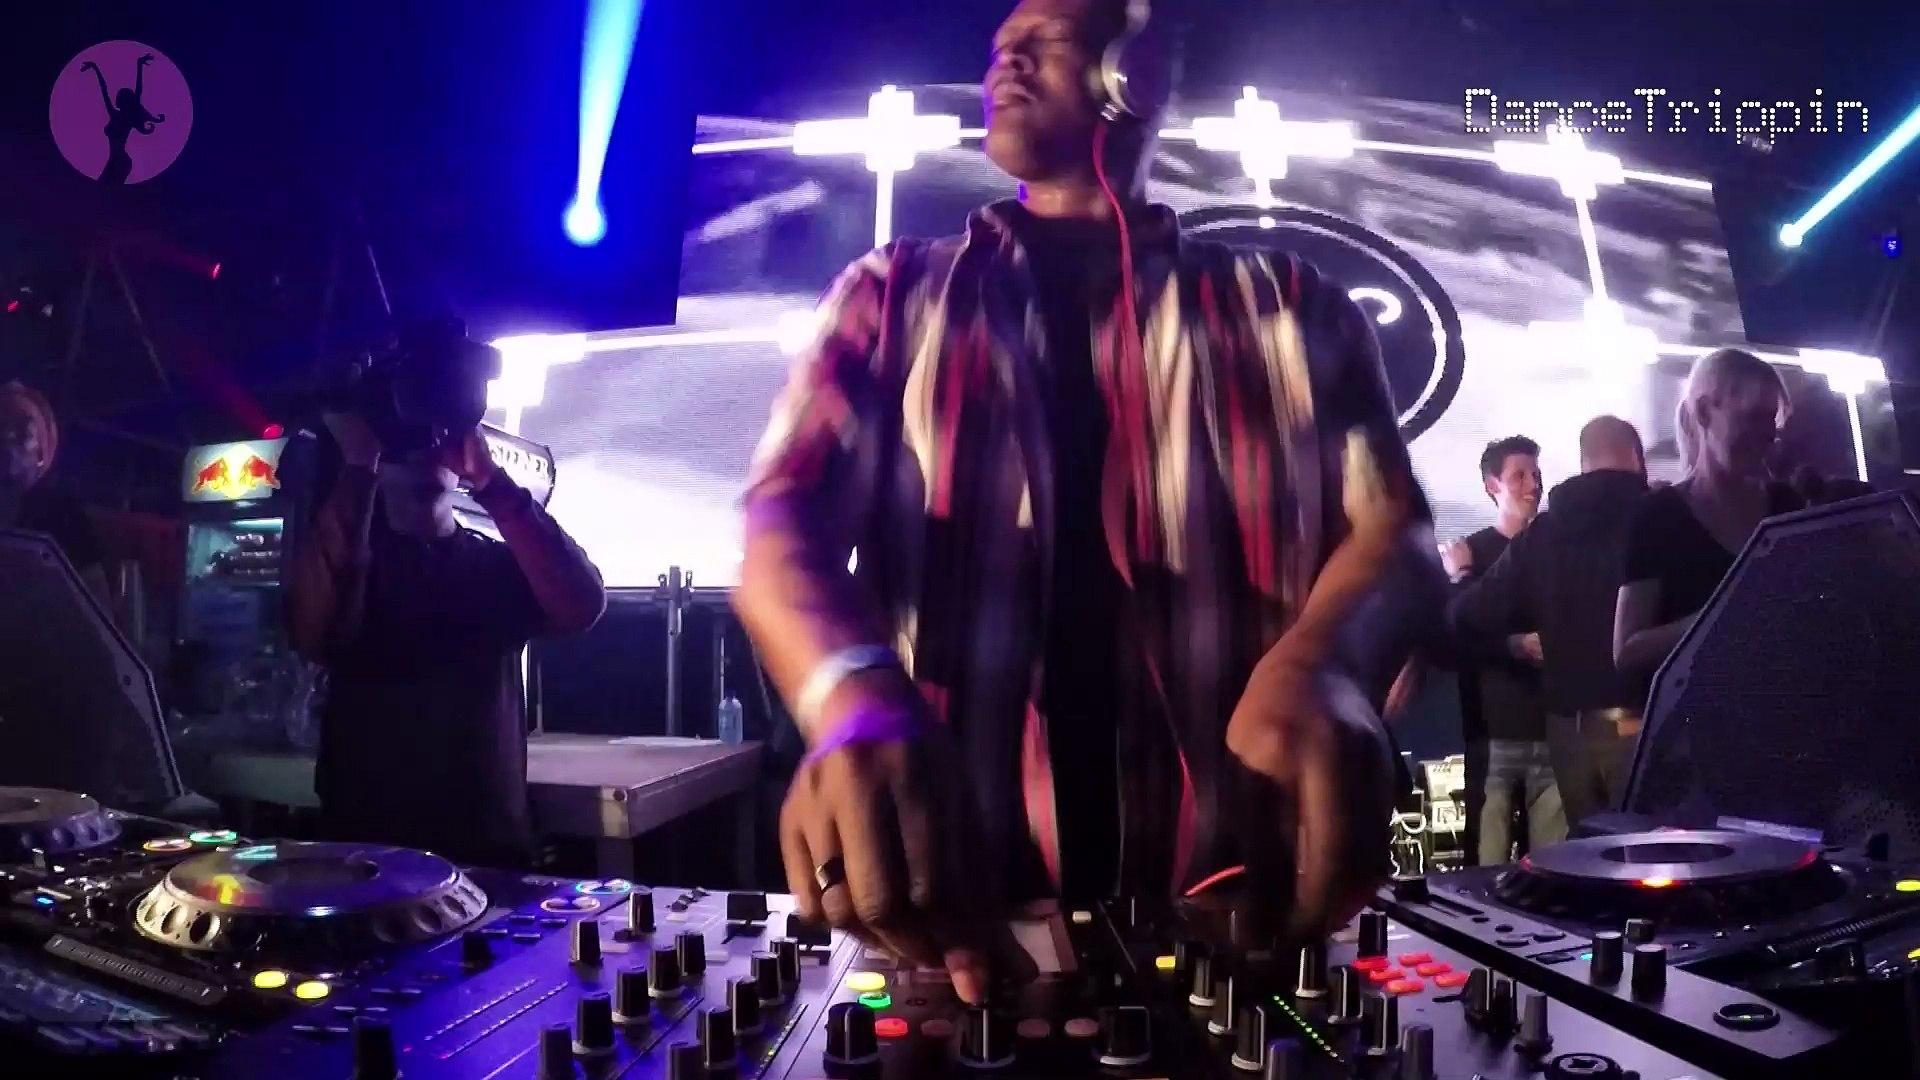 DJ Rush @ BLAKKSHEEP Showcase, Dockyard Festival ADE15 (Amsterdam)